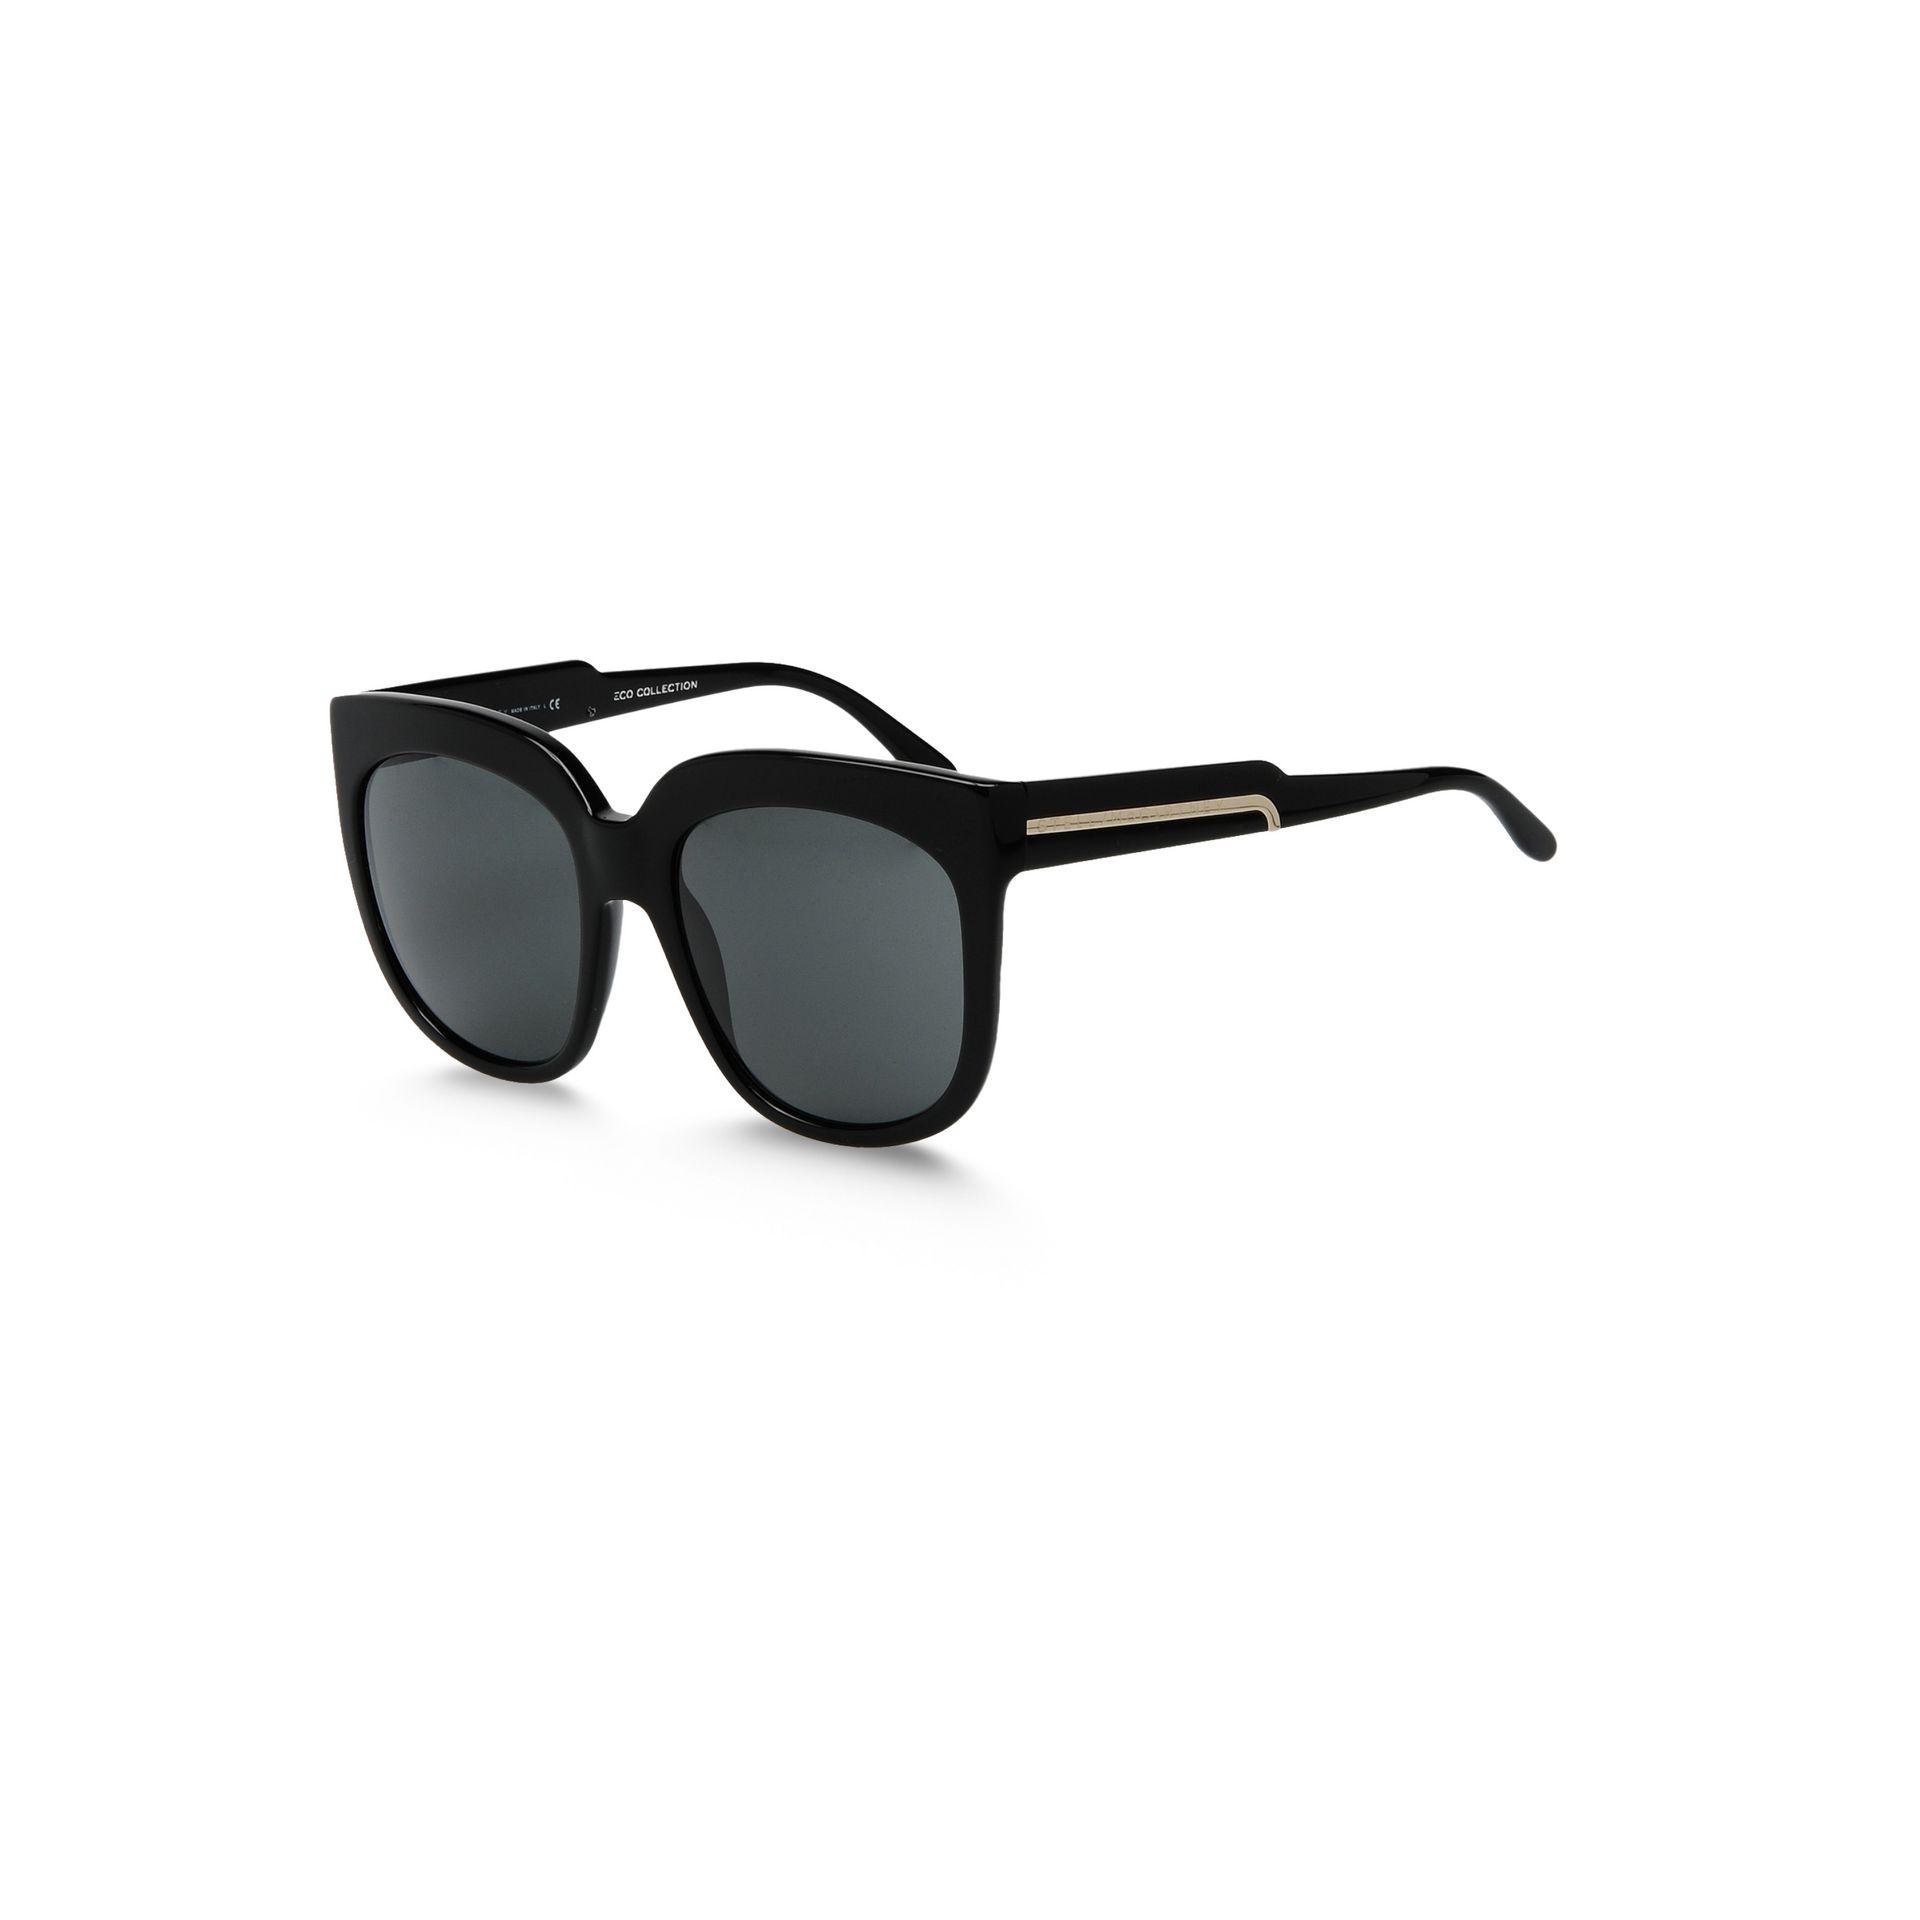 3c450742913 Stella Mccartney Black Sunglasses